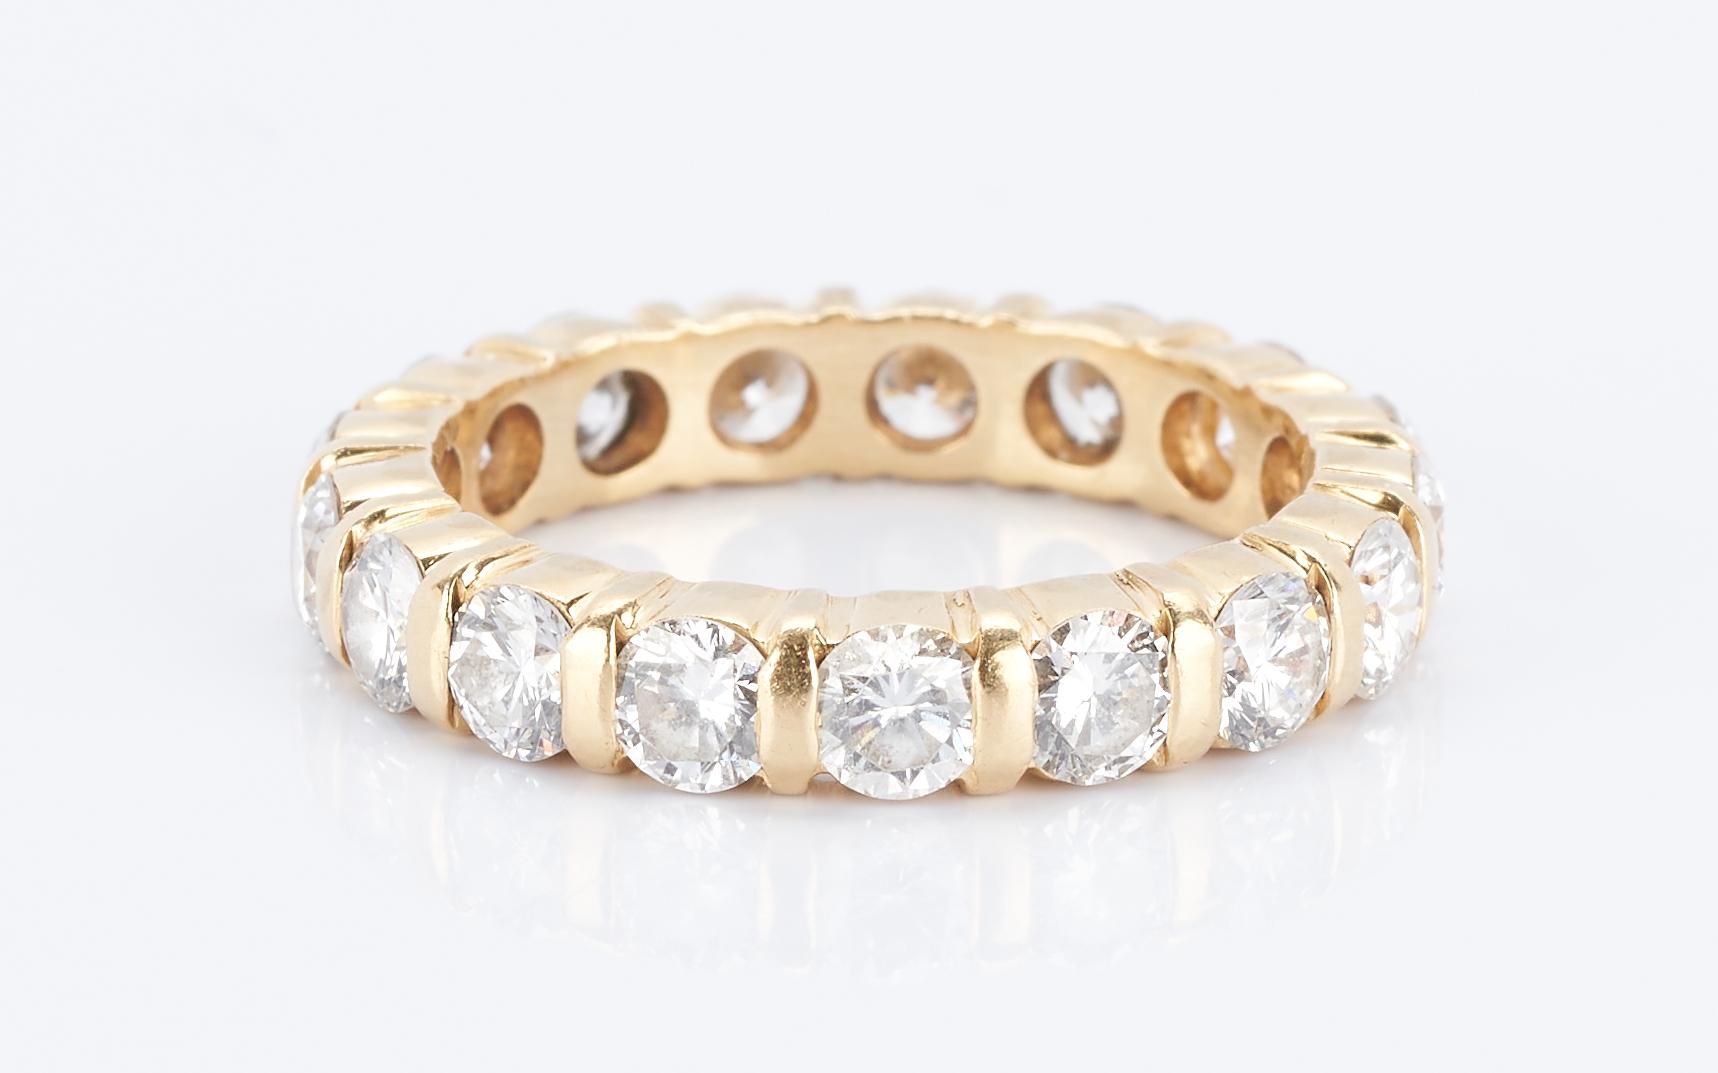 Lot 36: Cartier Ladies Diamond Eternity Ring